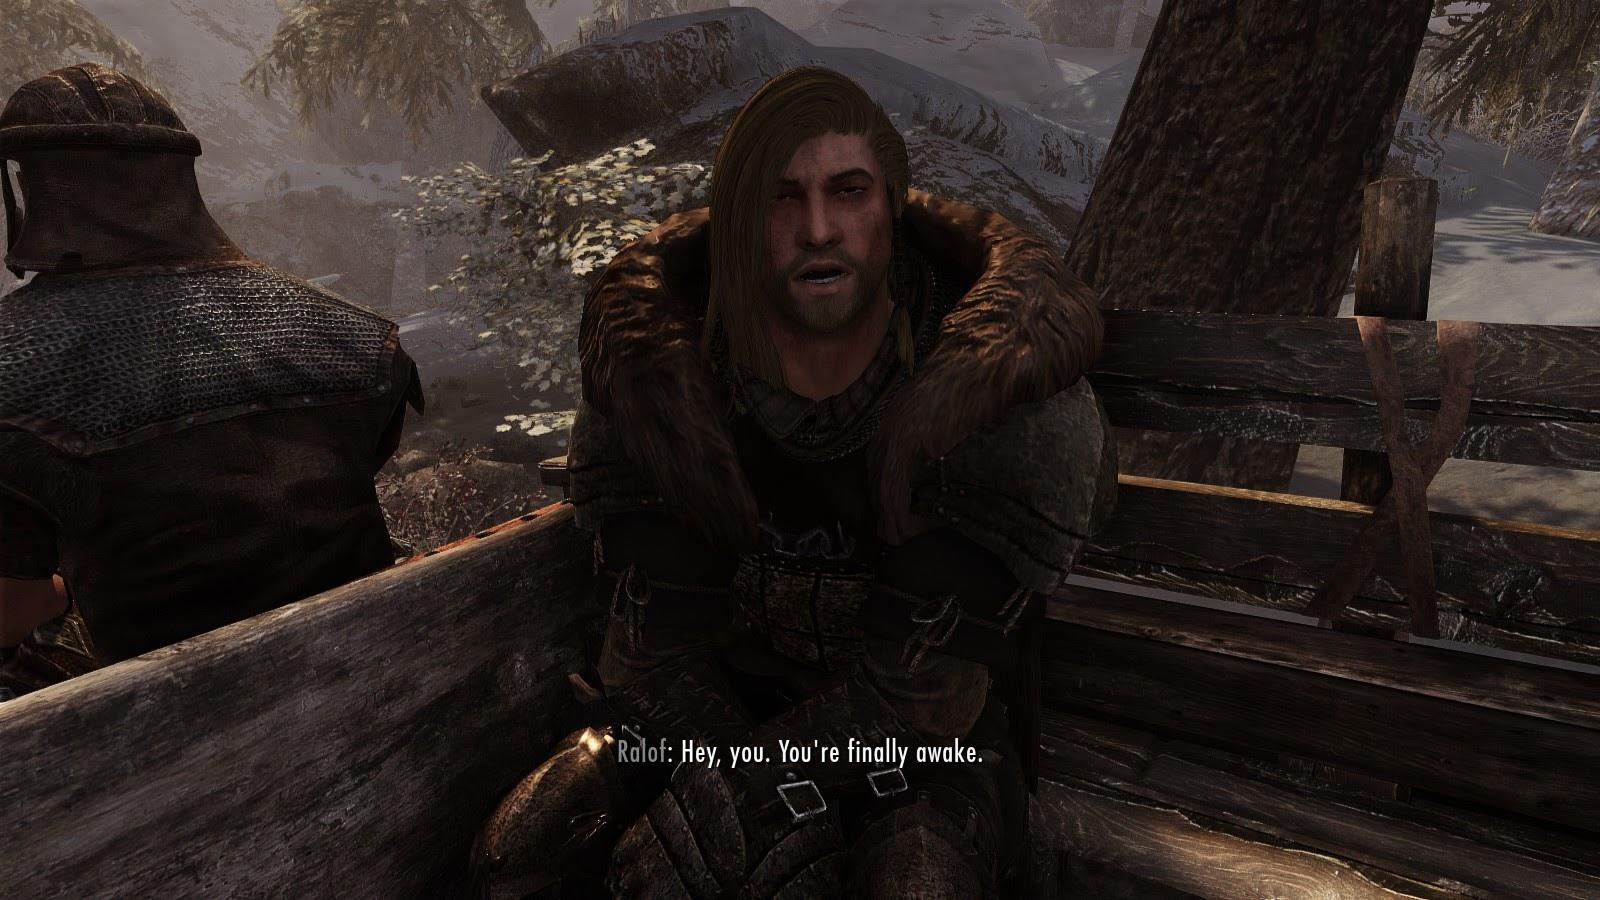 «  Hey, tu es finallement réveillé  », Scène de début du jeu, The Elder Scrolls V: Skyrim (Special Edition), Bethesda Game Studios, 2012